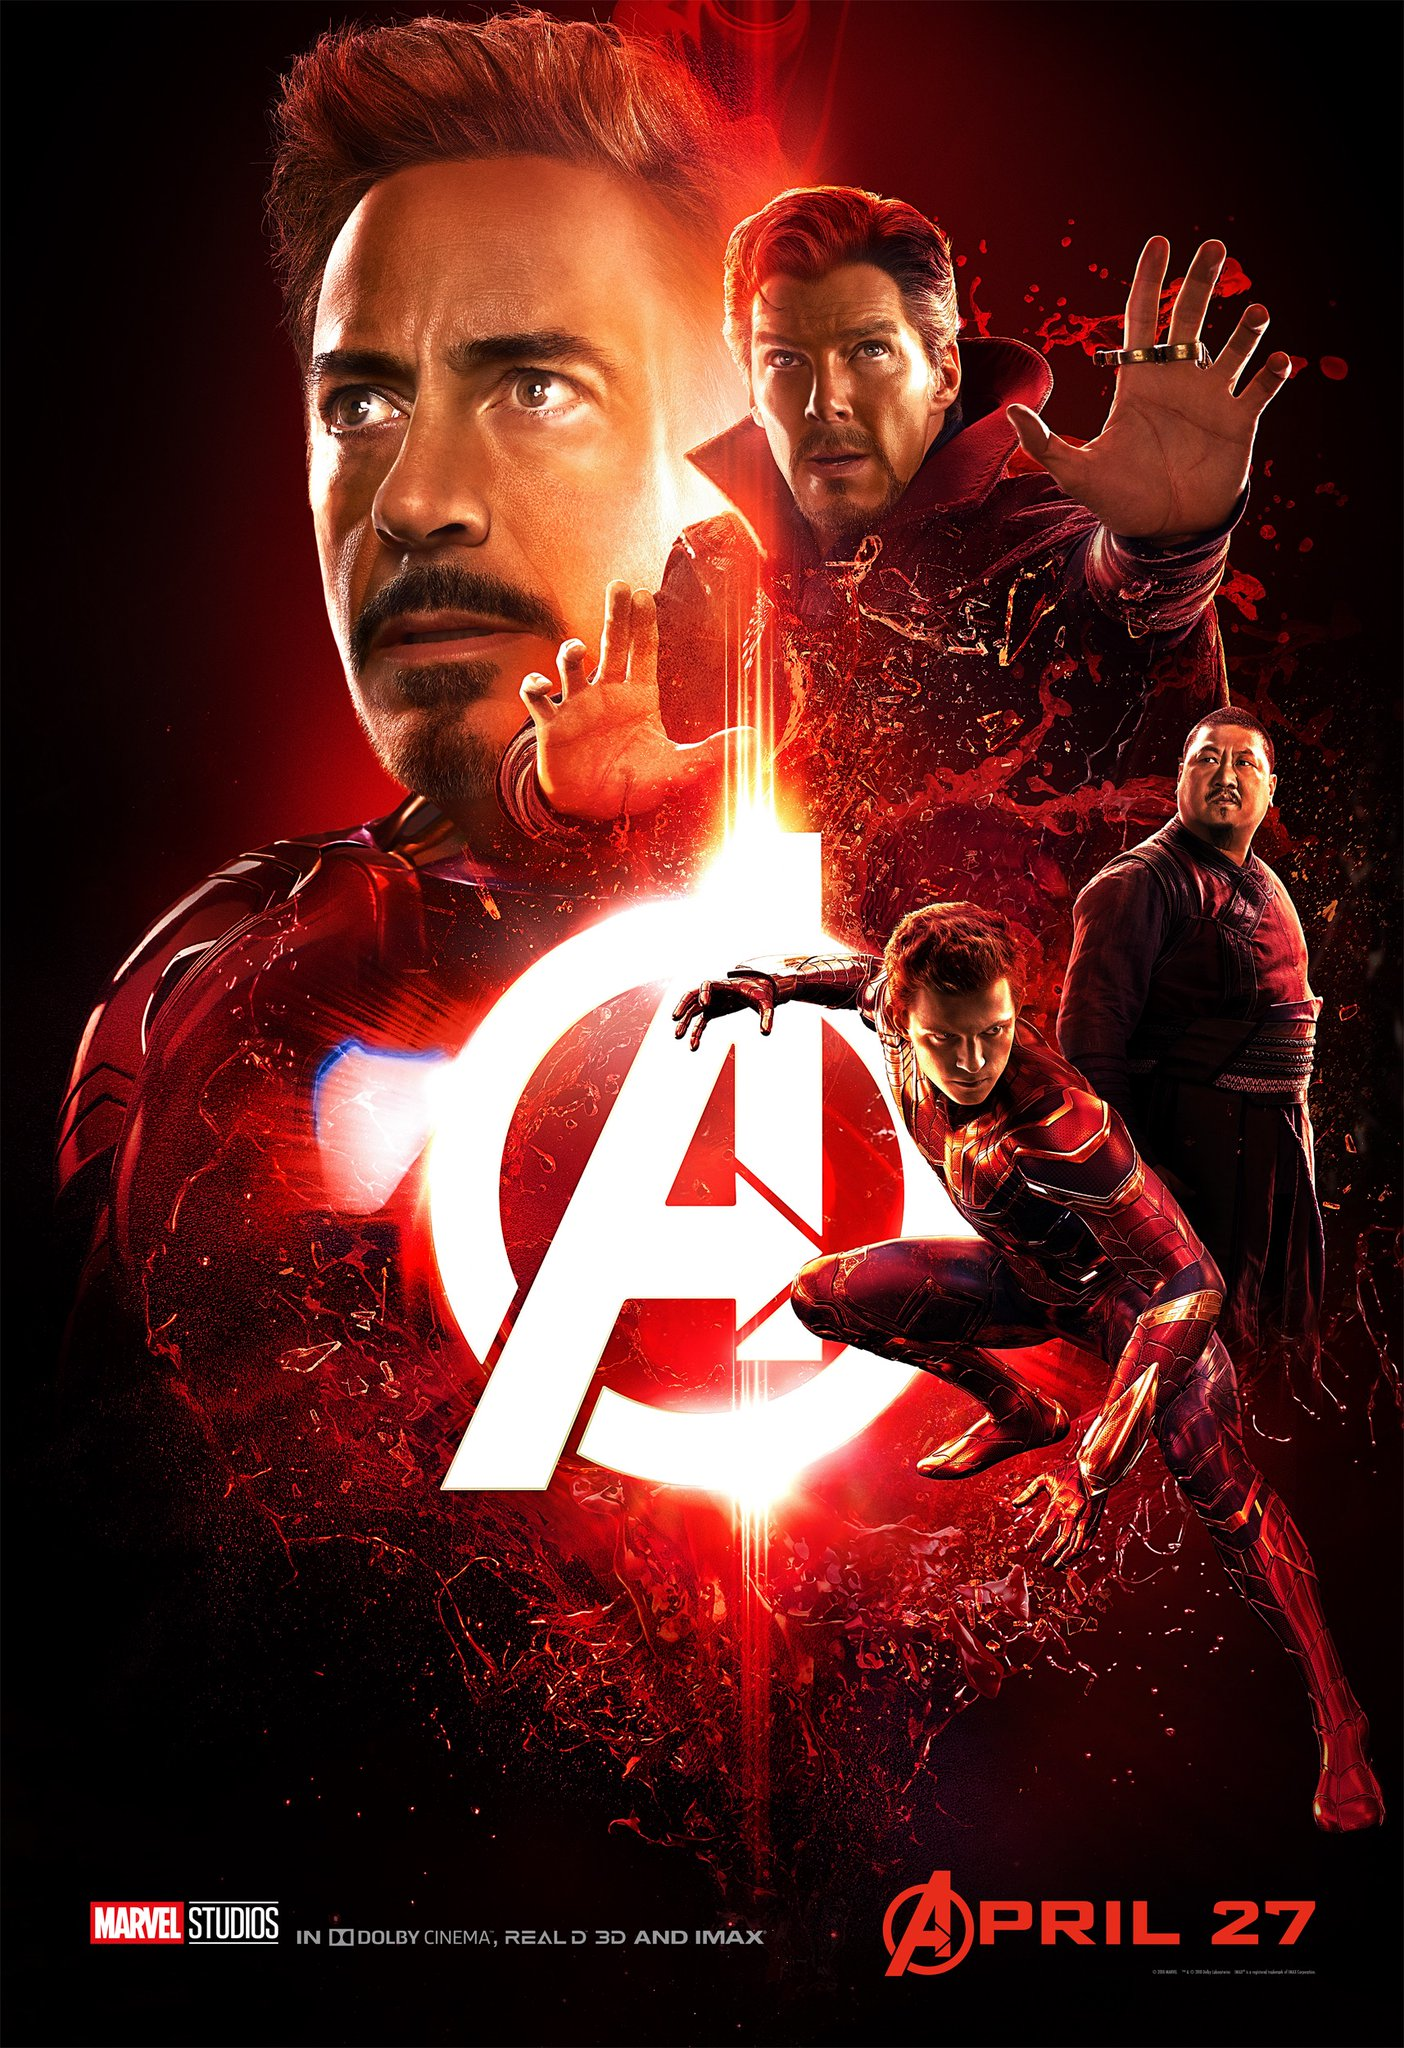 szmk_marvel_avengers_infinity_war_bosszuallok_vegtelen_haboru_thanos_vasember_hulk_thor_spiderman_ironman_amerika_kapitany_1.jpg